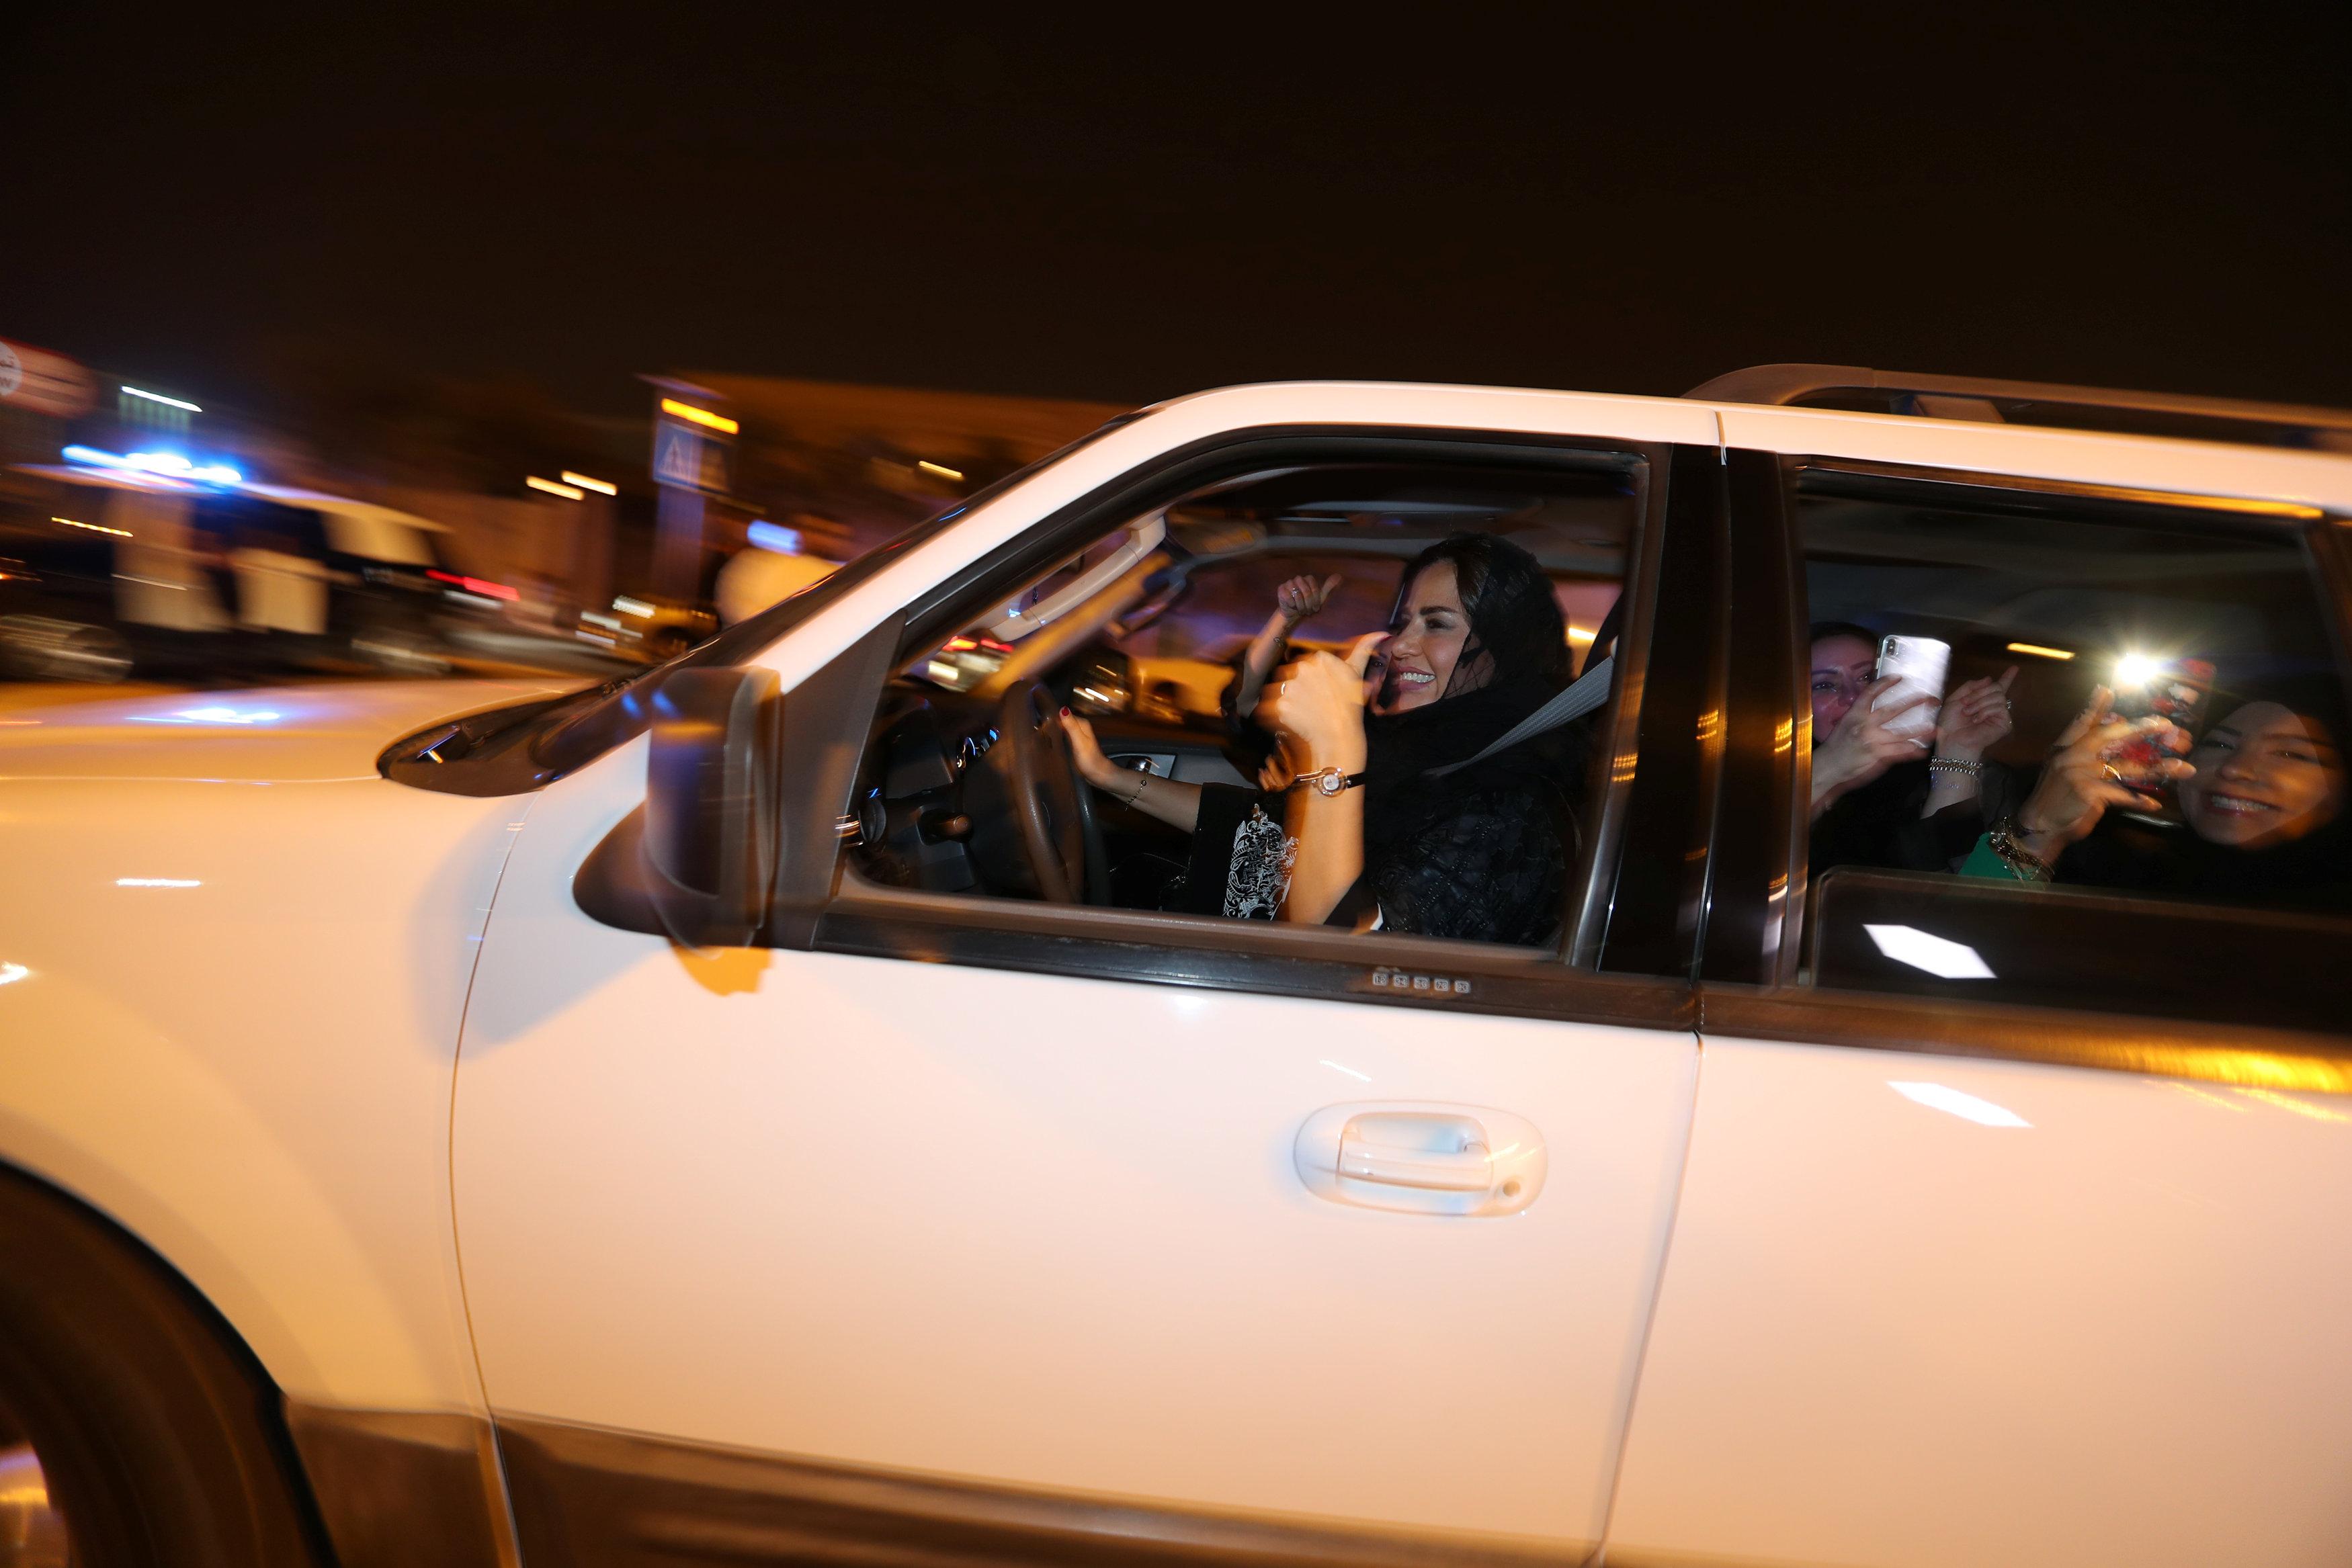 سيدة سعودية تحتفل مع صديقاتها وهي تقود سيارتها